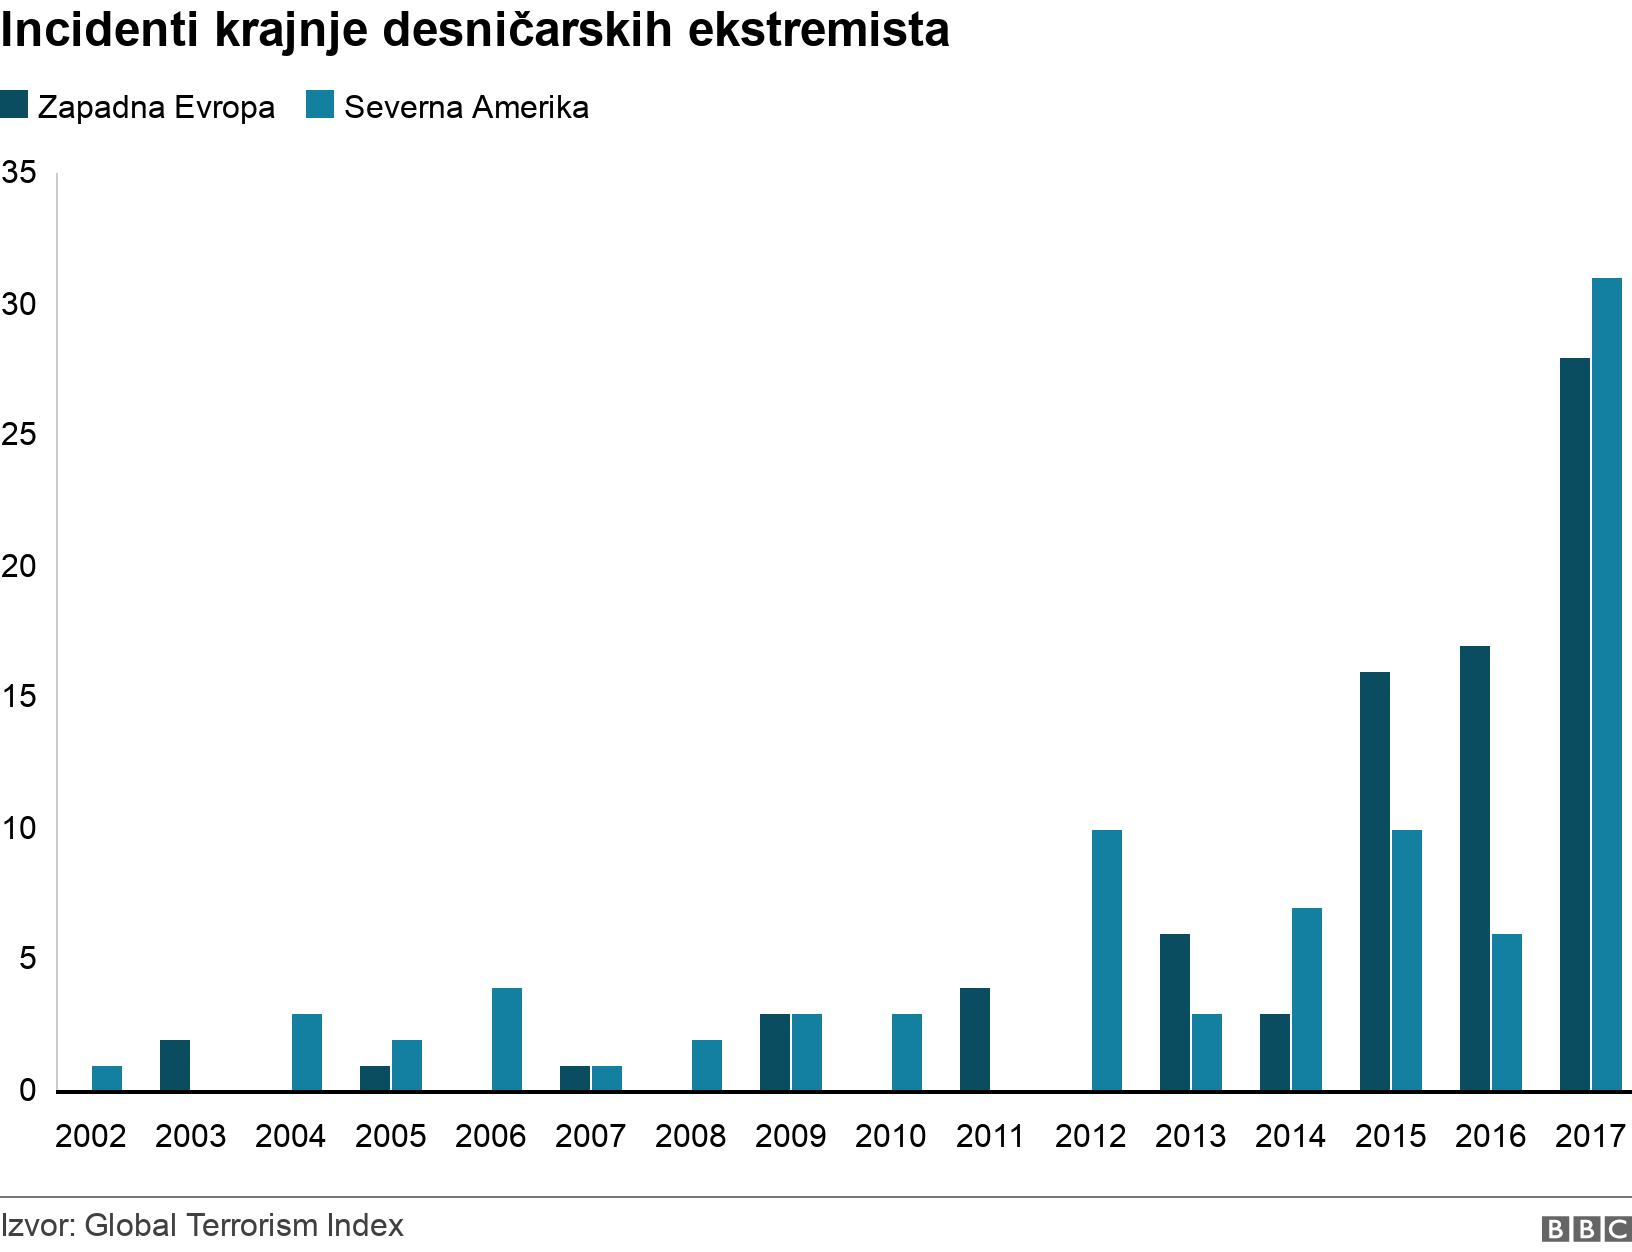 Incidenti krajnje desničarskih ekstremista. . Incidents by far-right extremists .